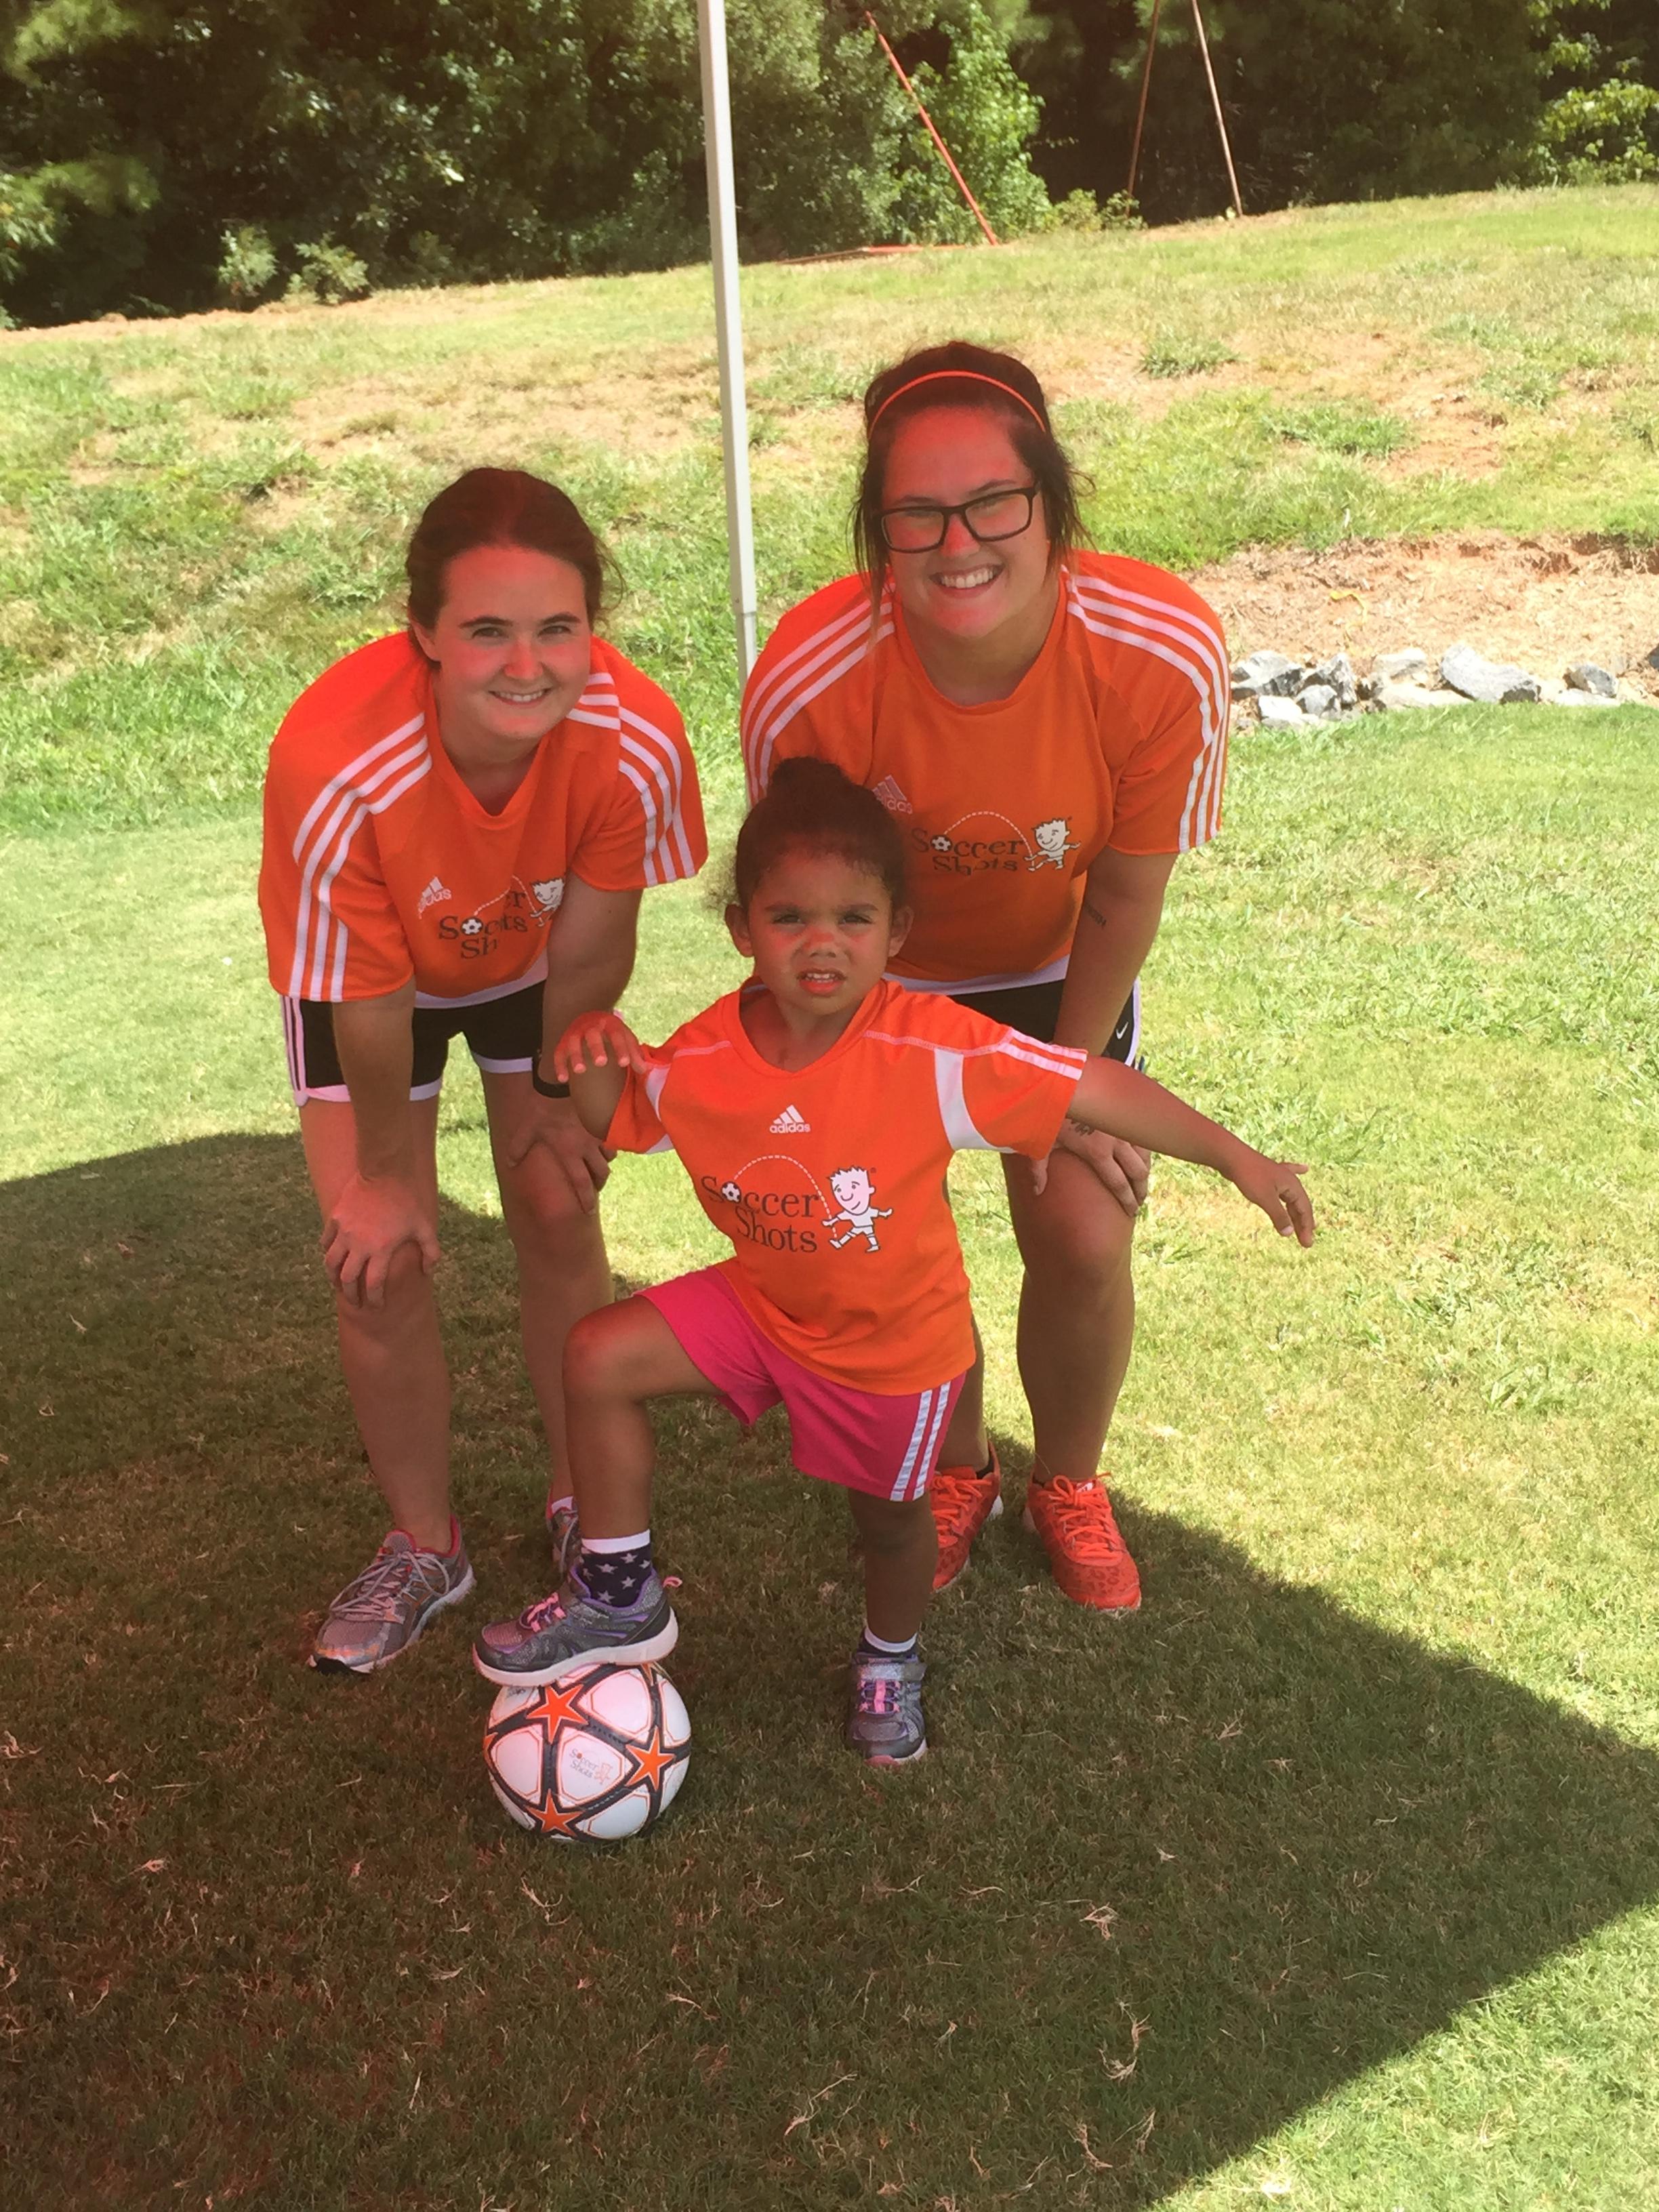 Ava O Soccer